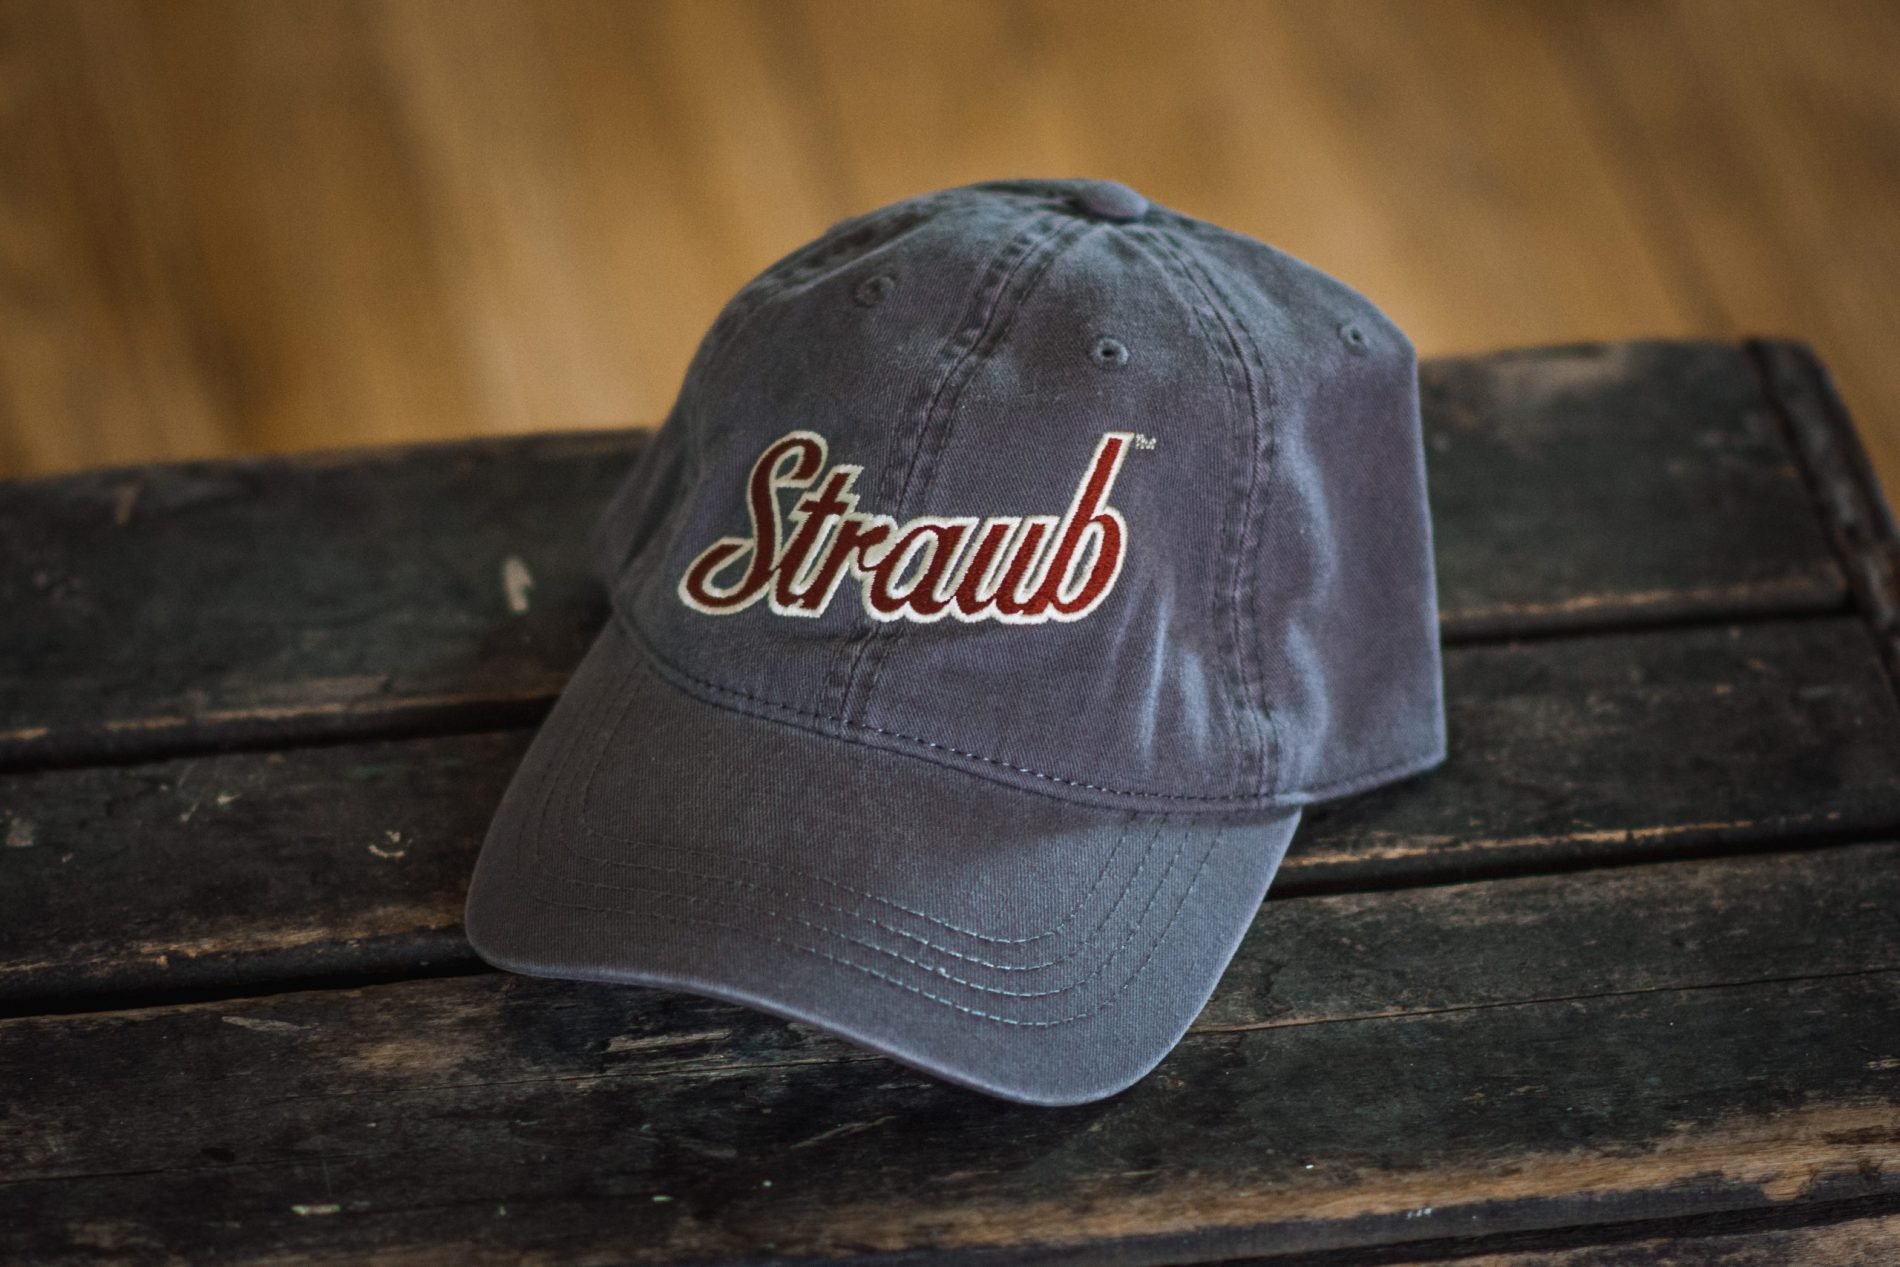 Straub vintage gray baseball hat